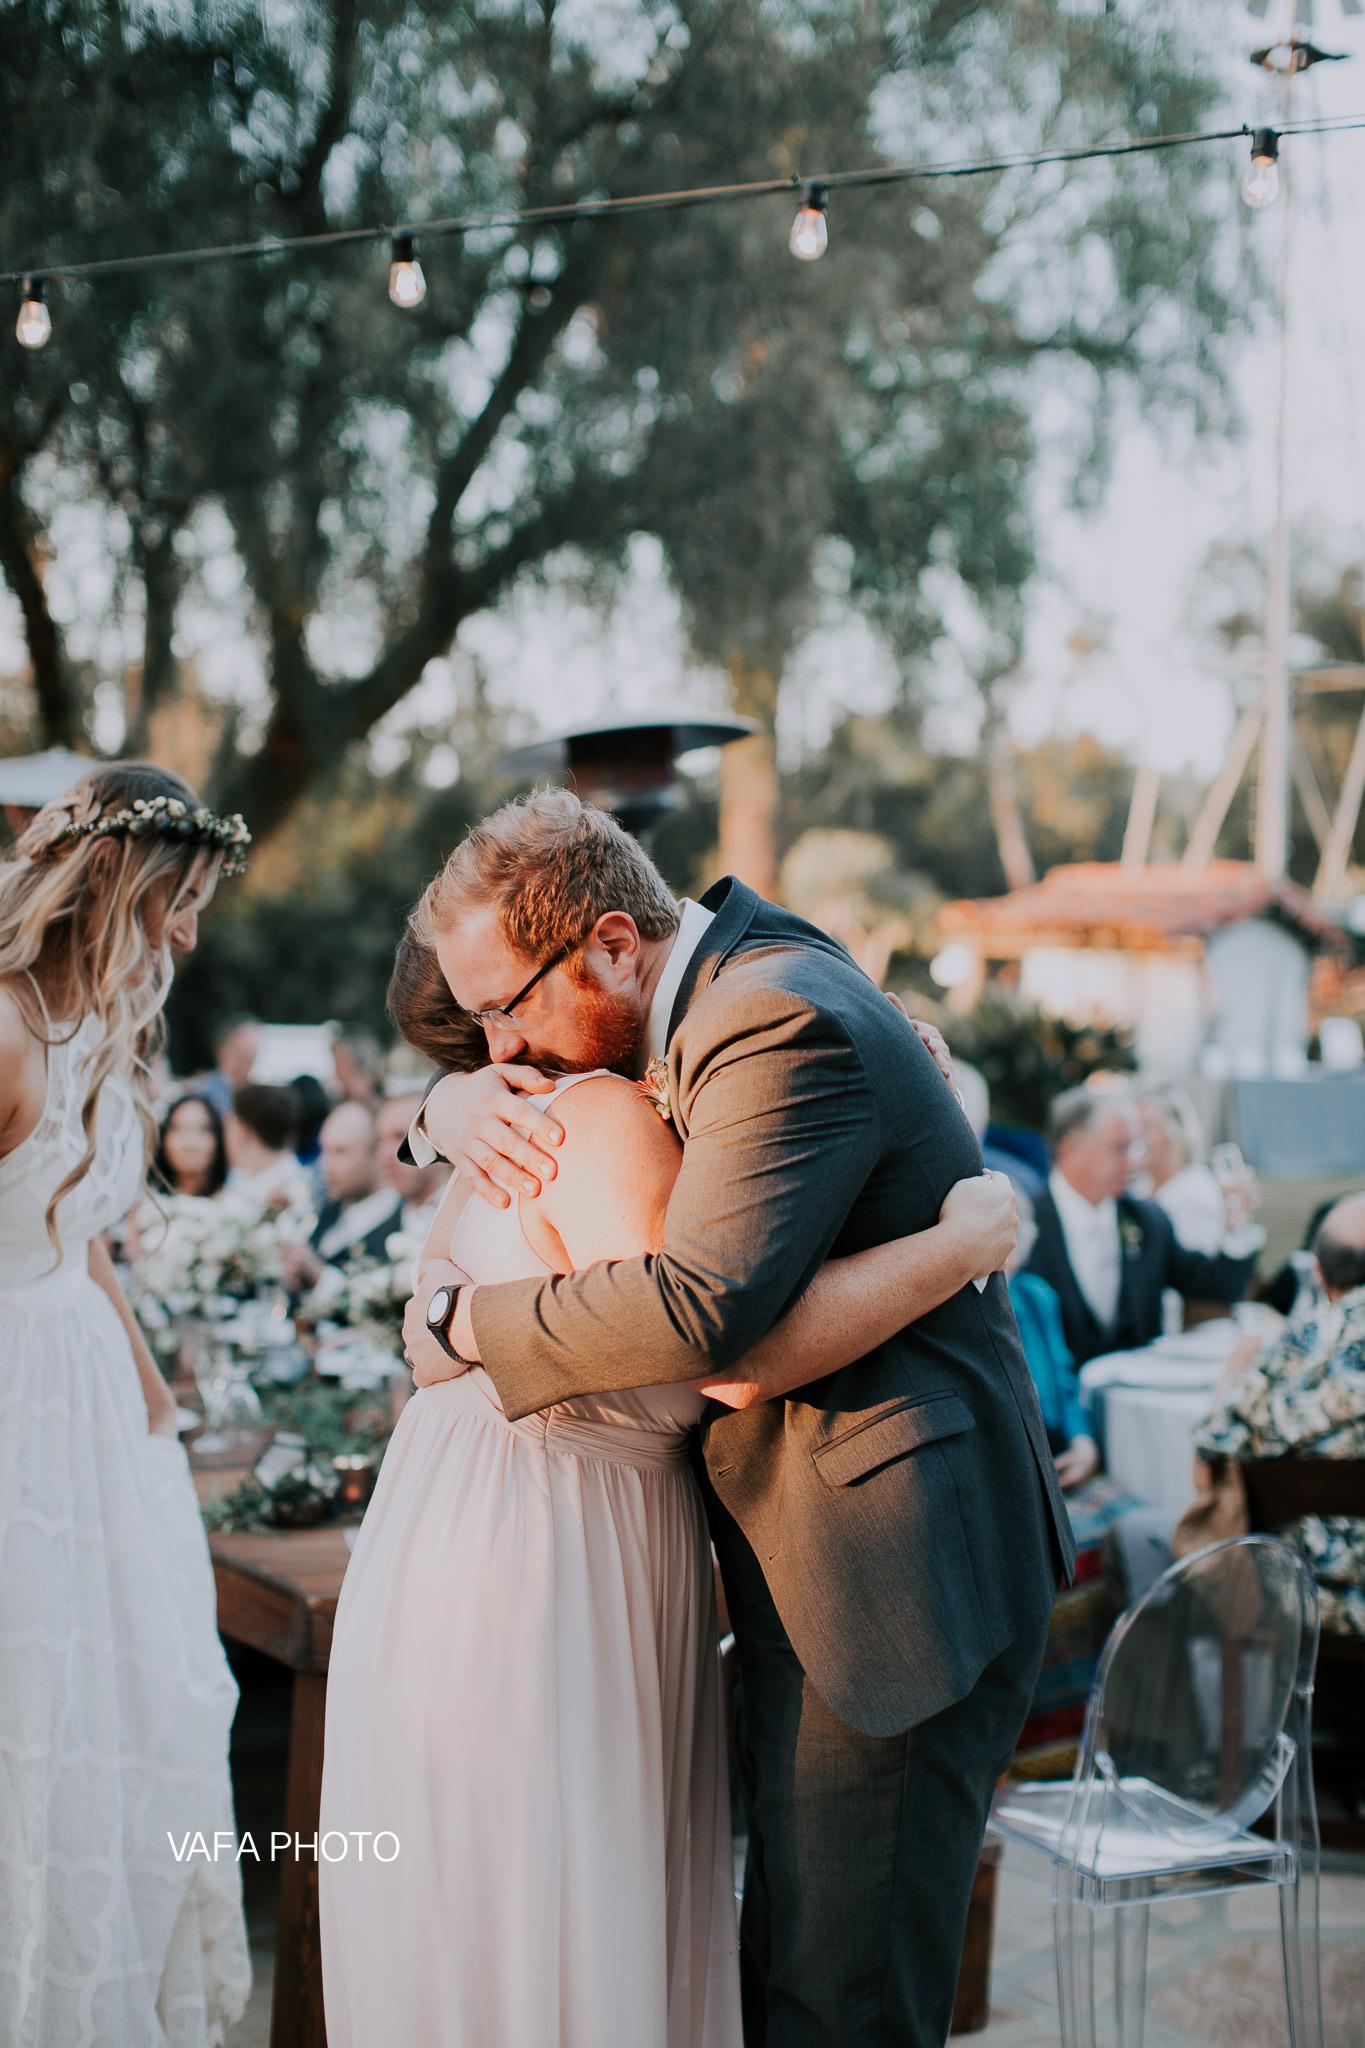 Leo-Carrillo-Ranch-Wedding-Lauren-Mike-Vafa-Photo-1014.jpg